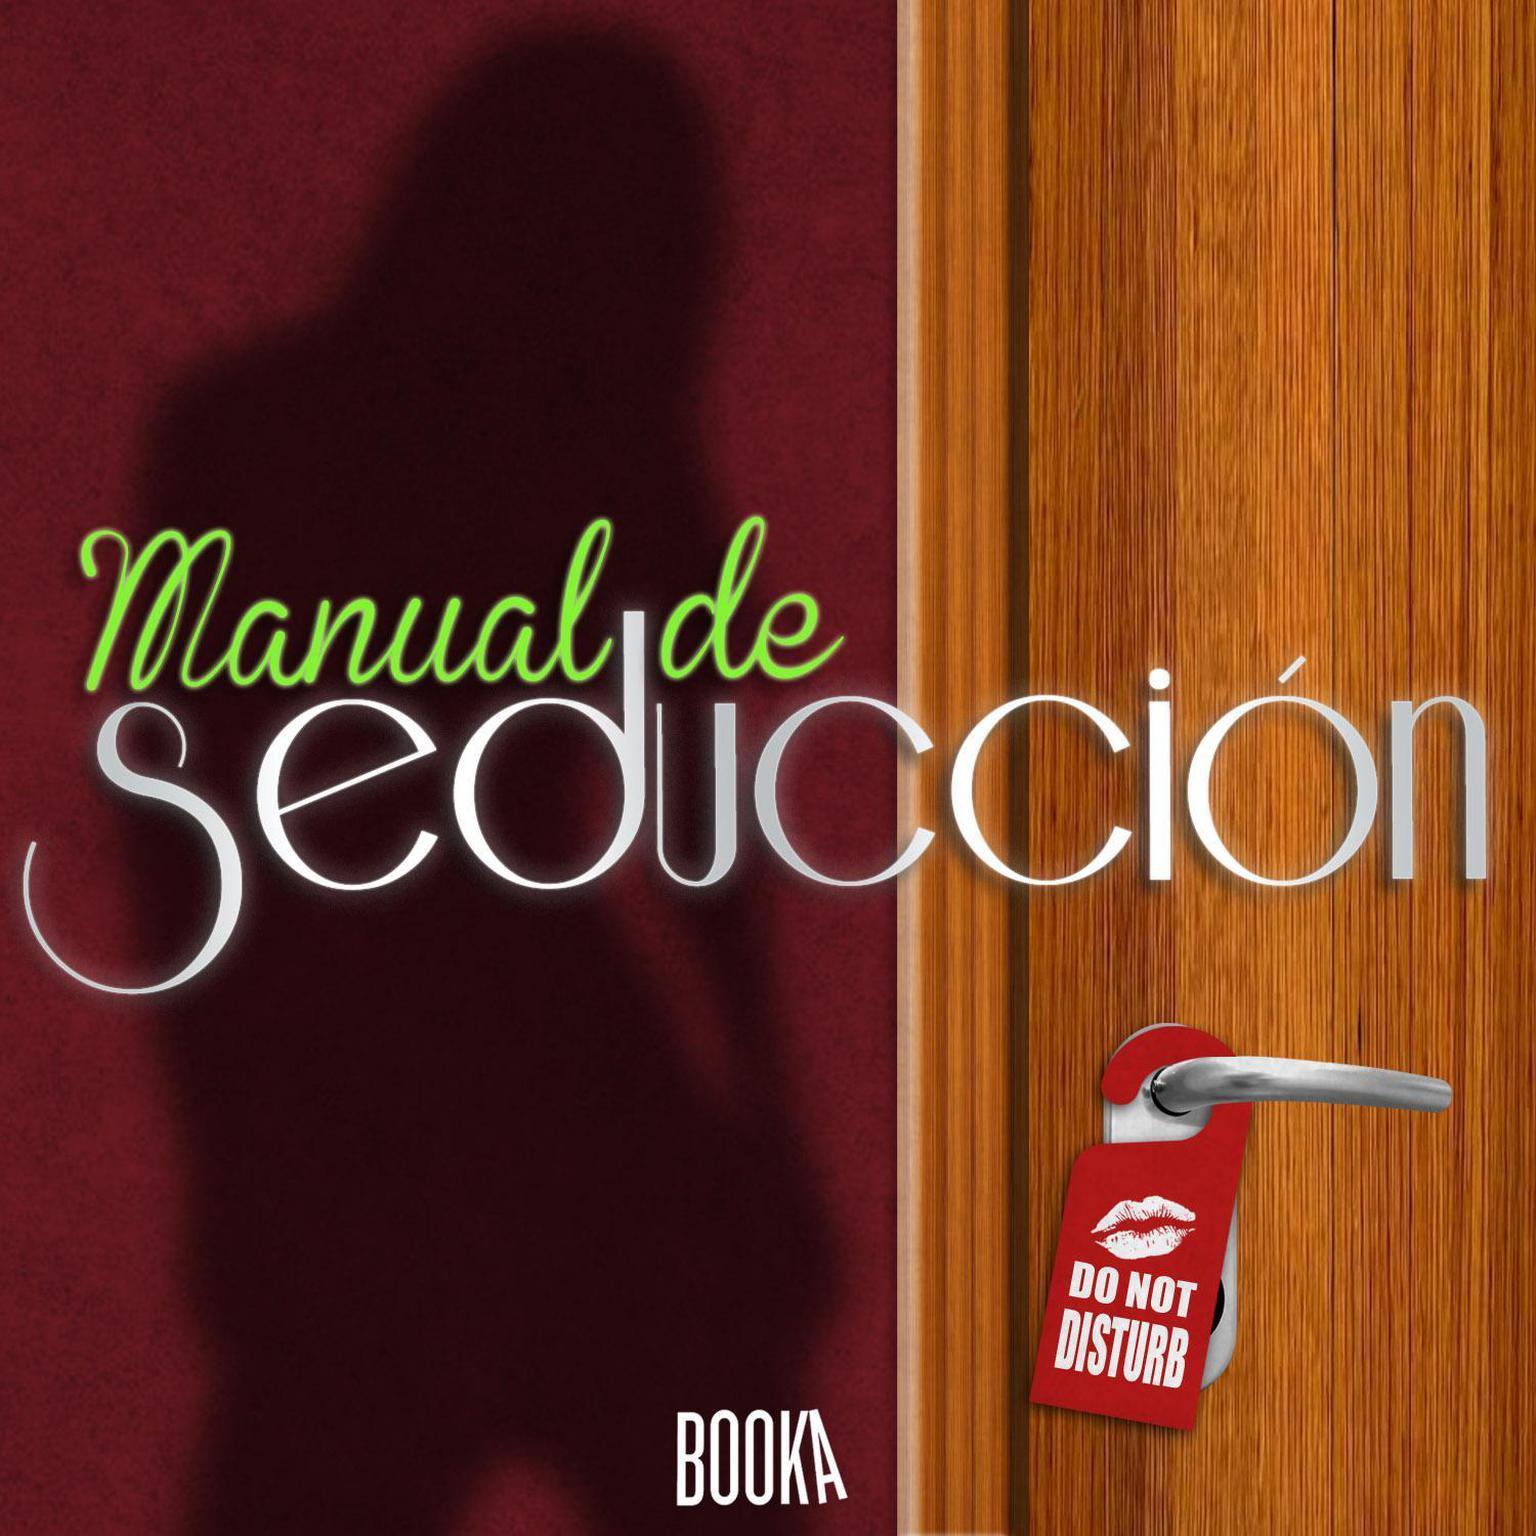 Manual de Seduccion (Seduction Manual) Audiobook, by Anonymous